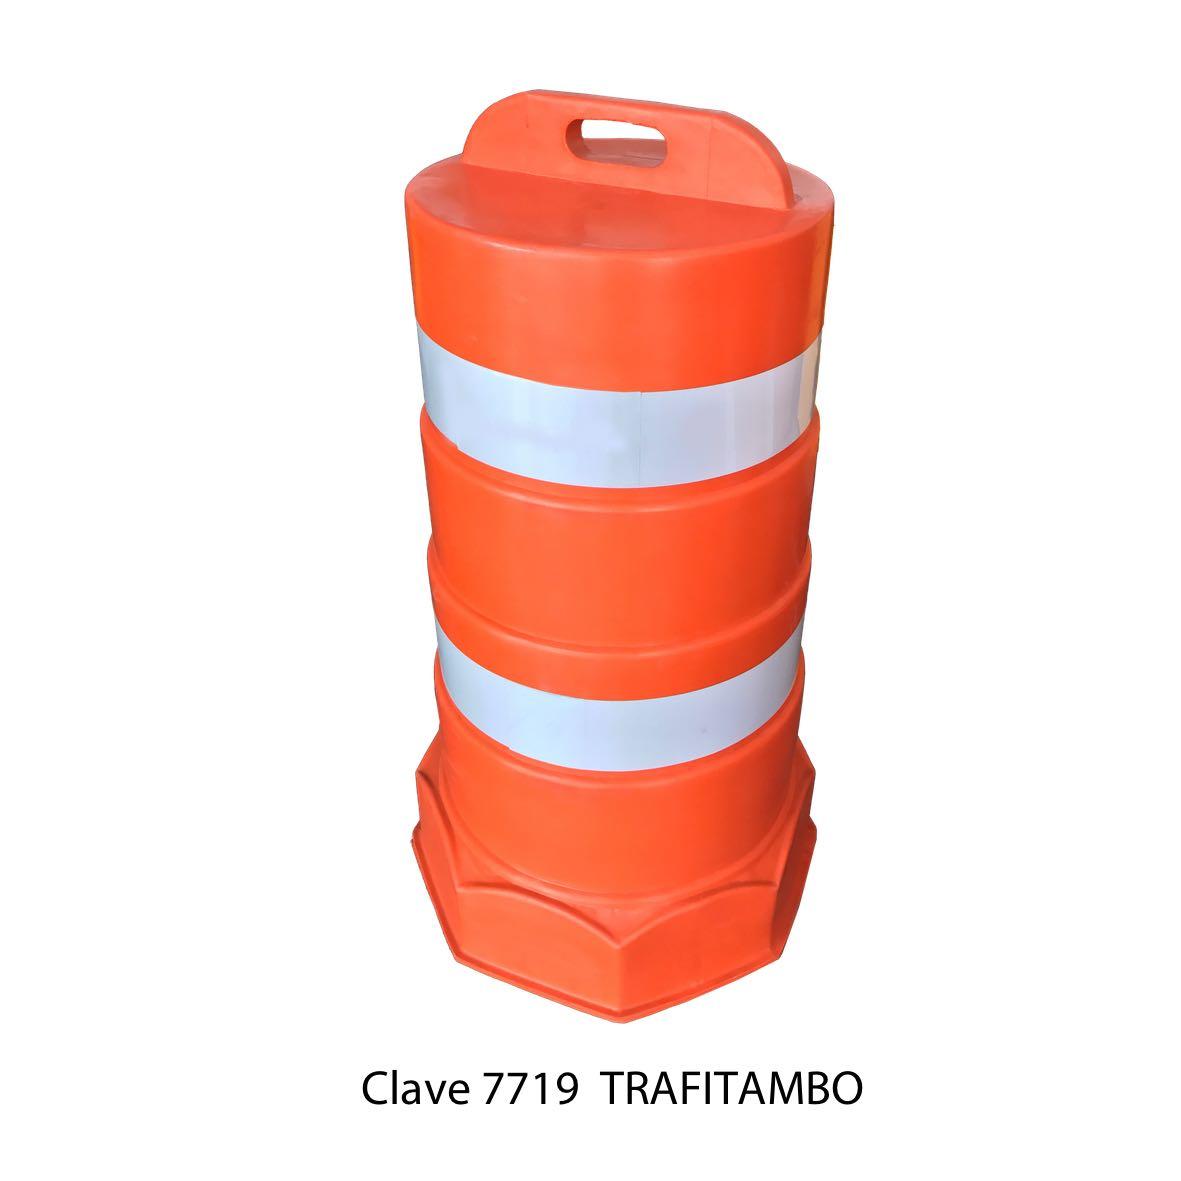 Trafitambo color naranja Clave 7719 Sablón